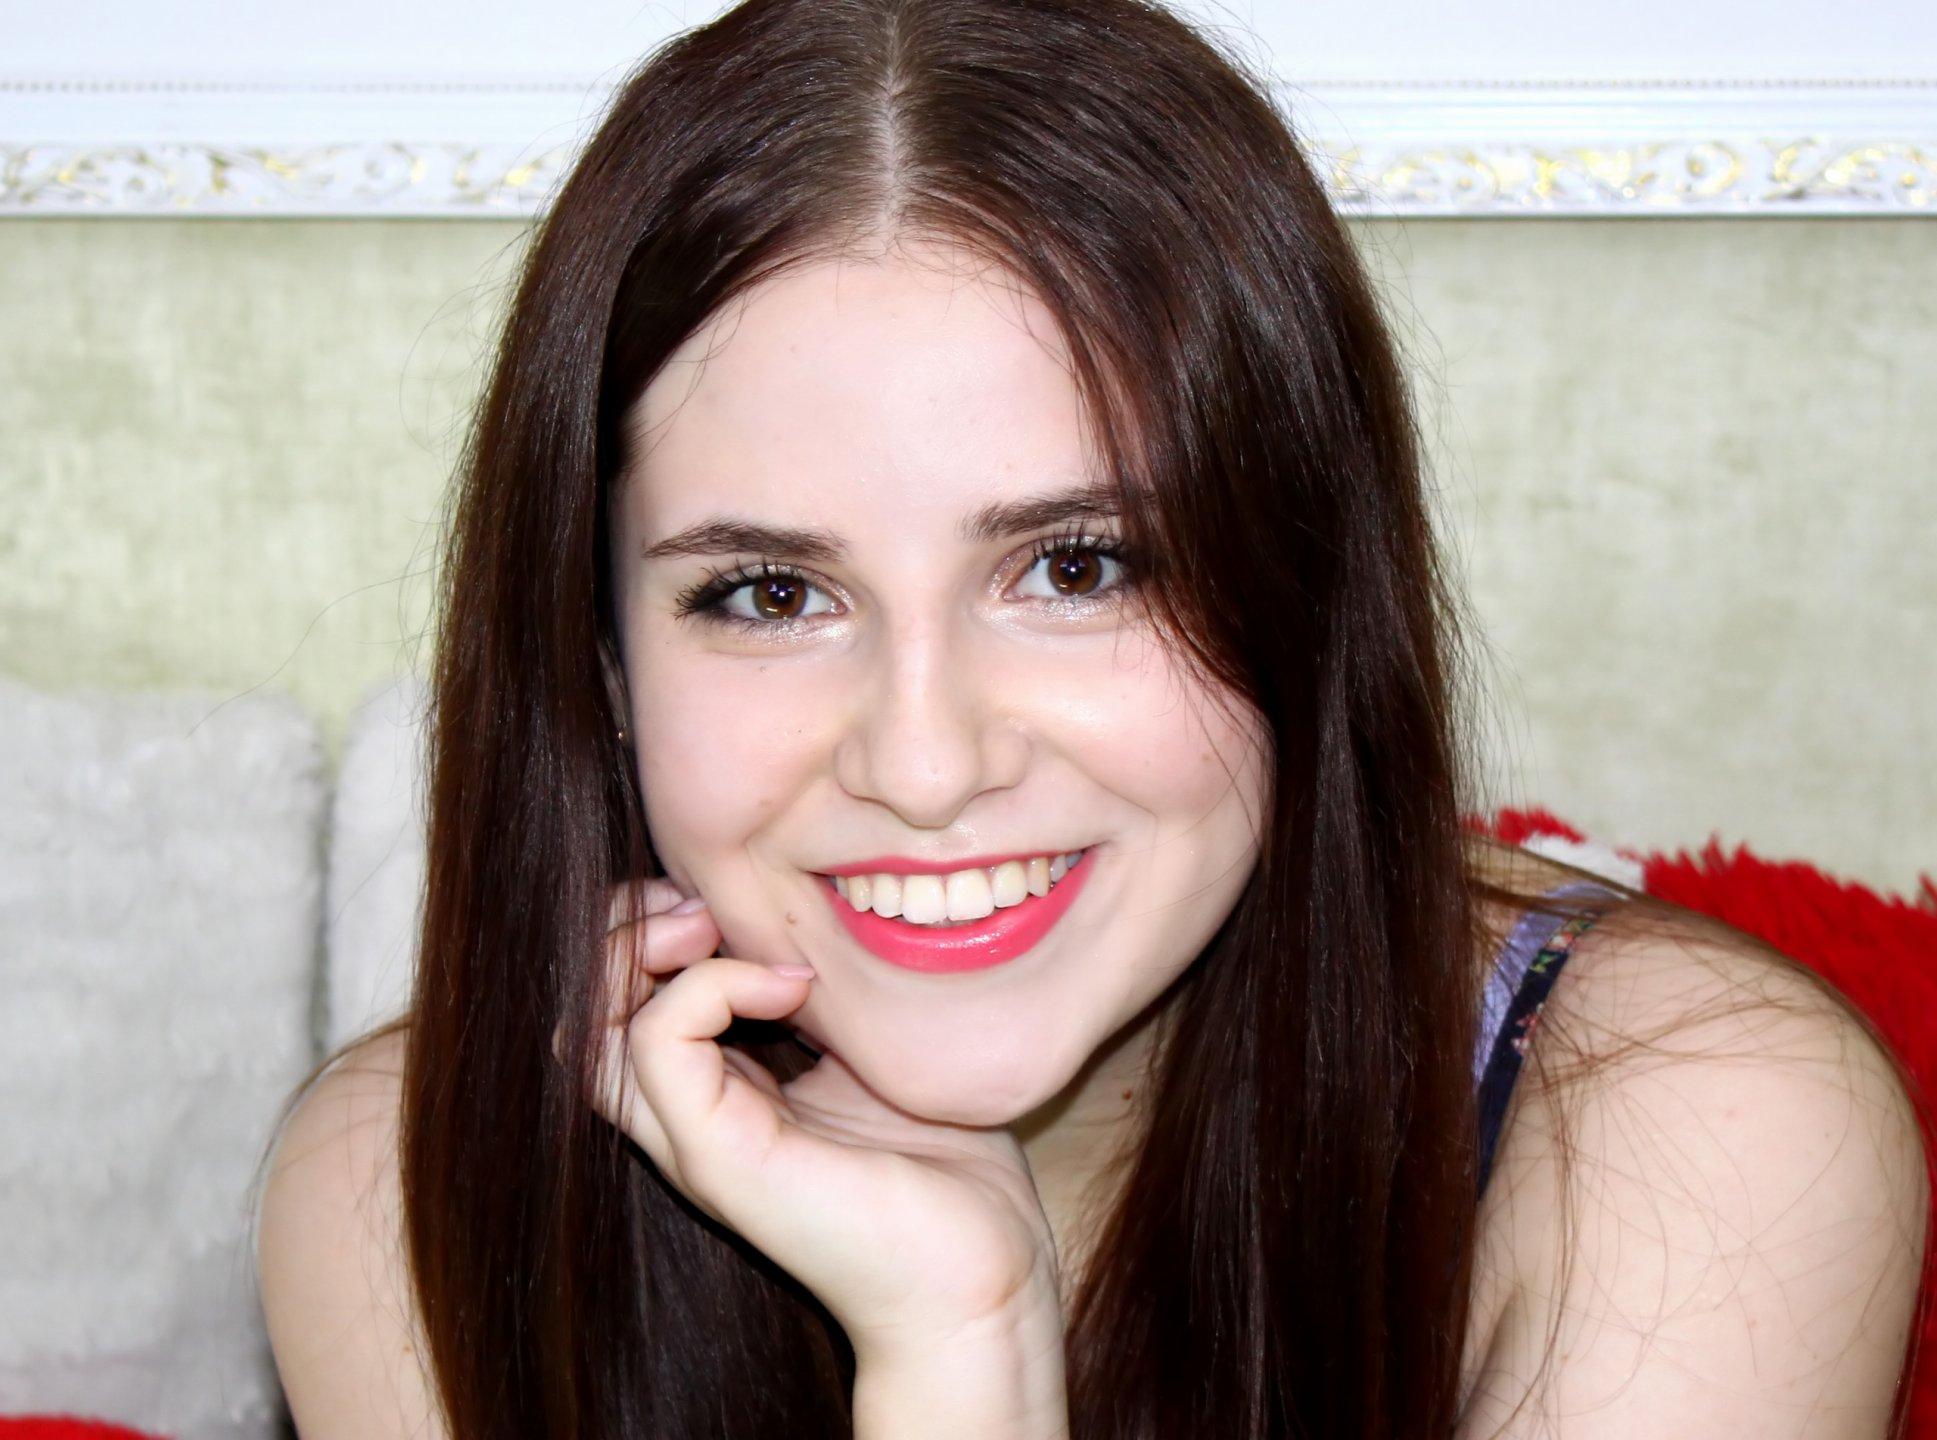 Webcam erotic of Consuelo69, a gigantic titty redhead